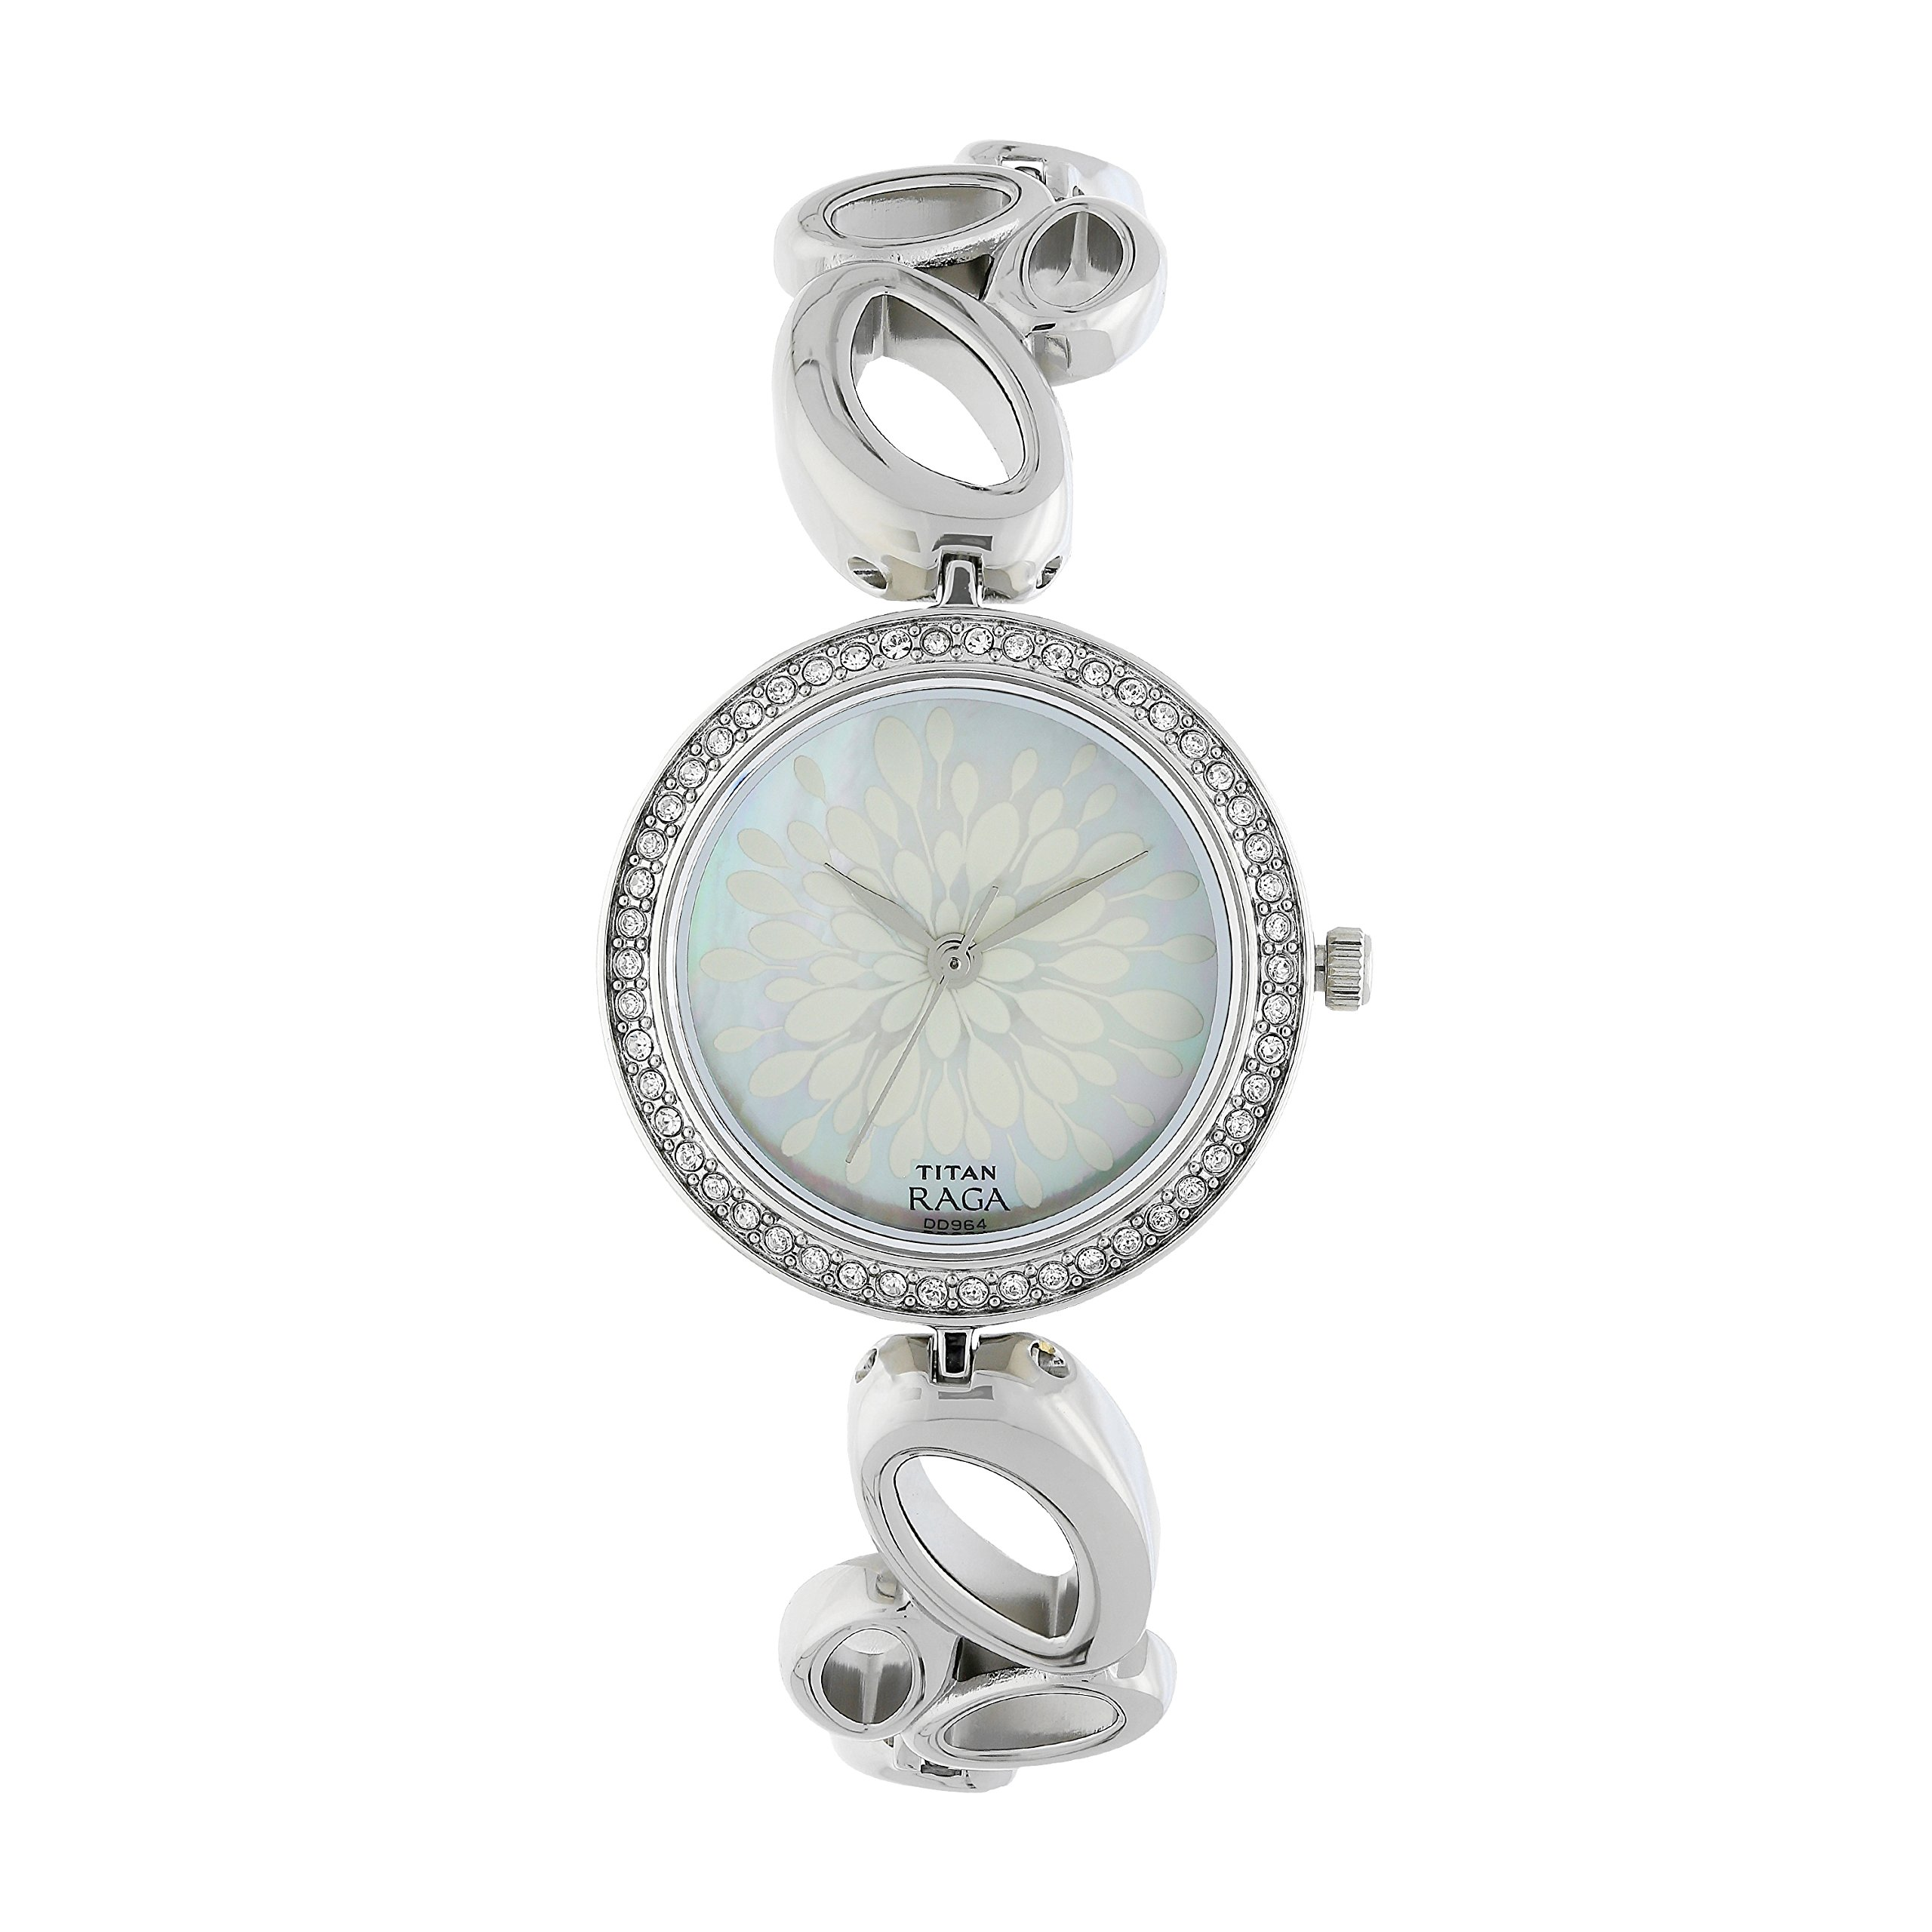 Titan Women's Raga Swarovski Crystal, Mother of Pearl Dial, Gold/Silver/Brass Metal, Jewellery Design, Bracelet Style, Designer, Quartz Glass, Water Resistant Wrist Watch